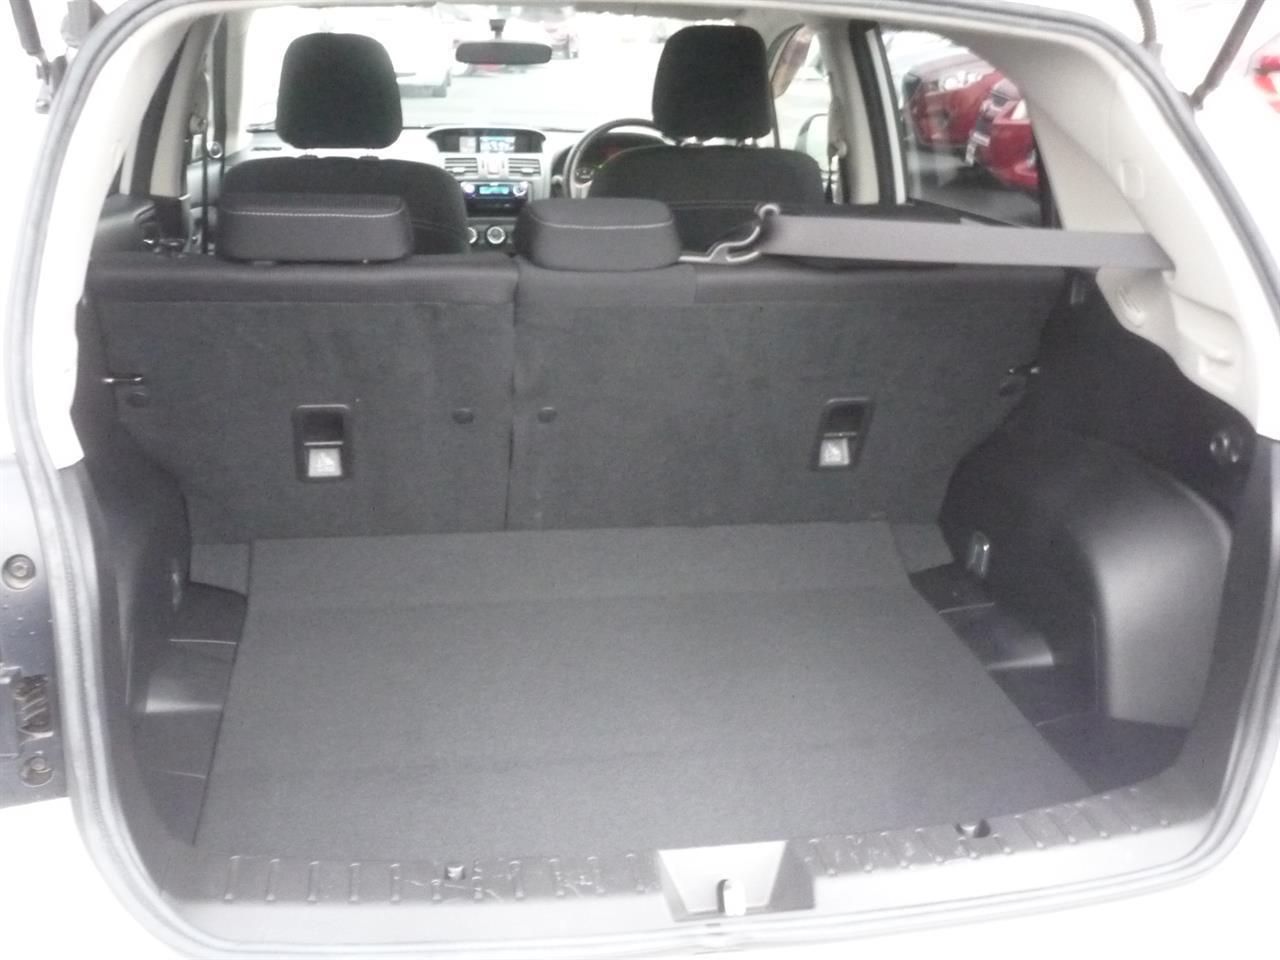 image-14, 2012 Subaru Impreza 1.6i-L 2WD at Dunedin